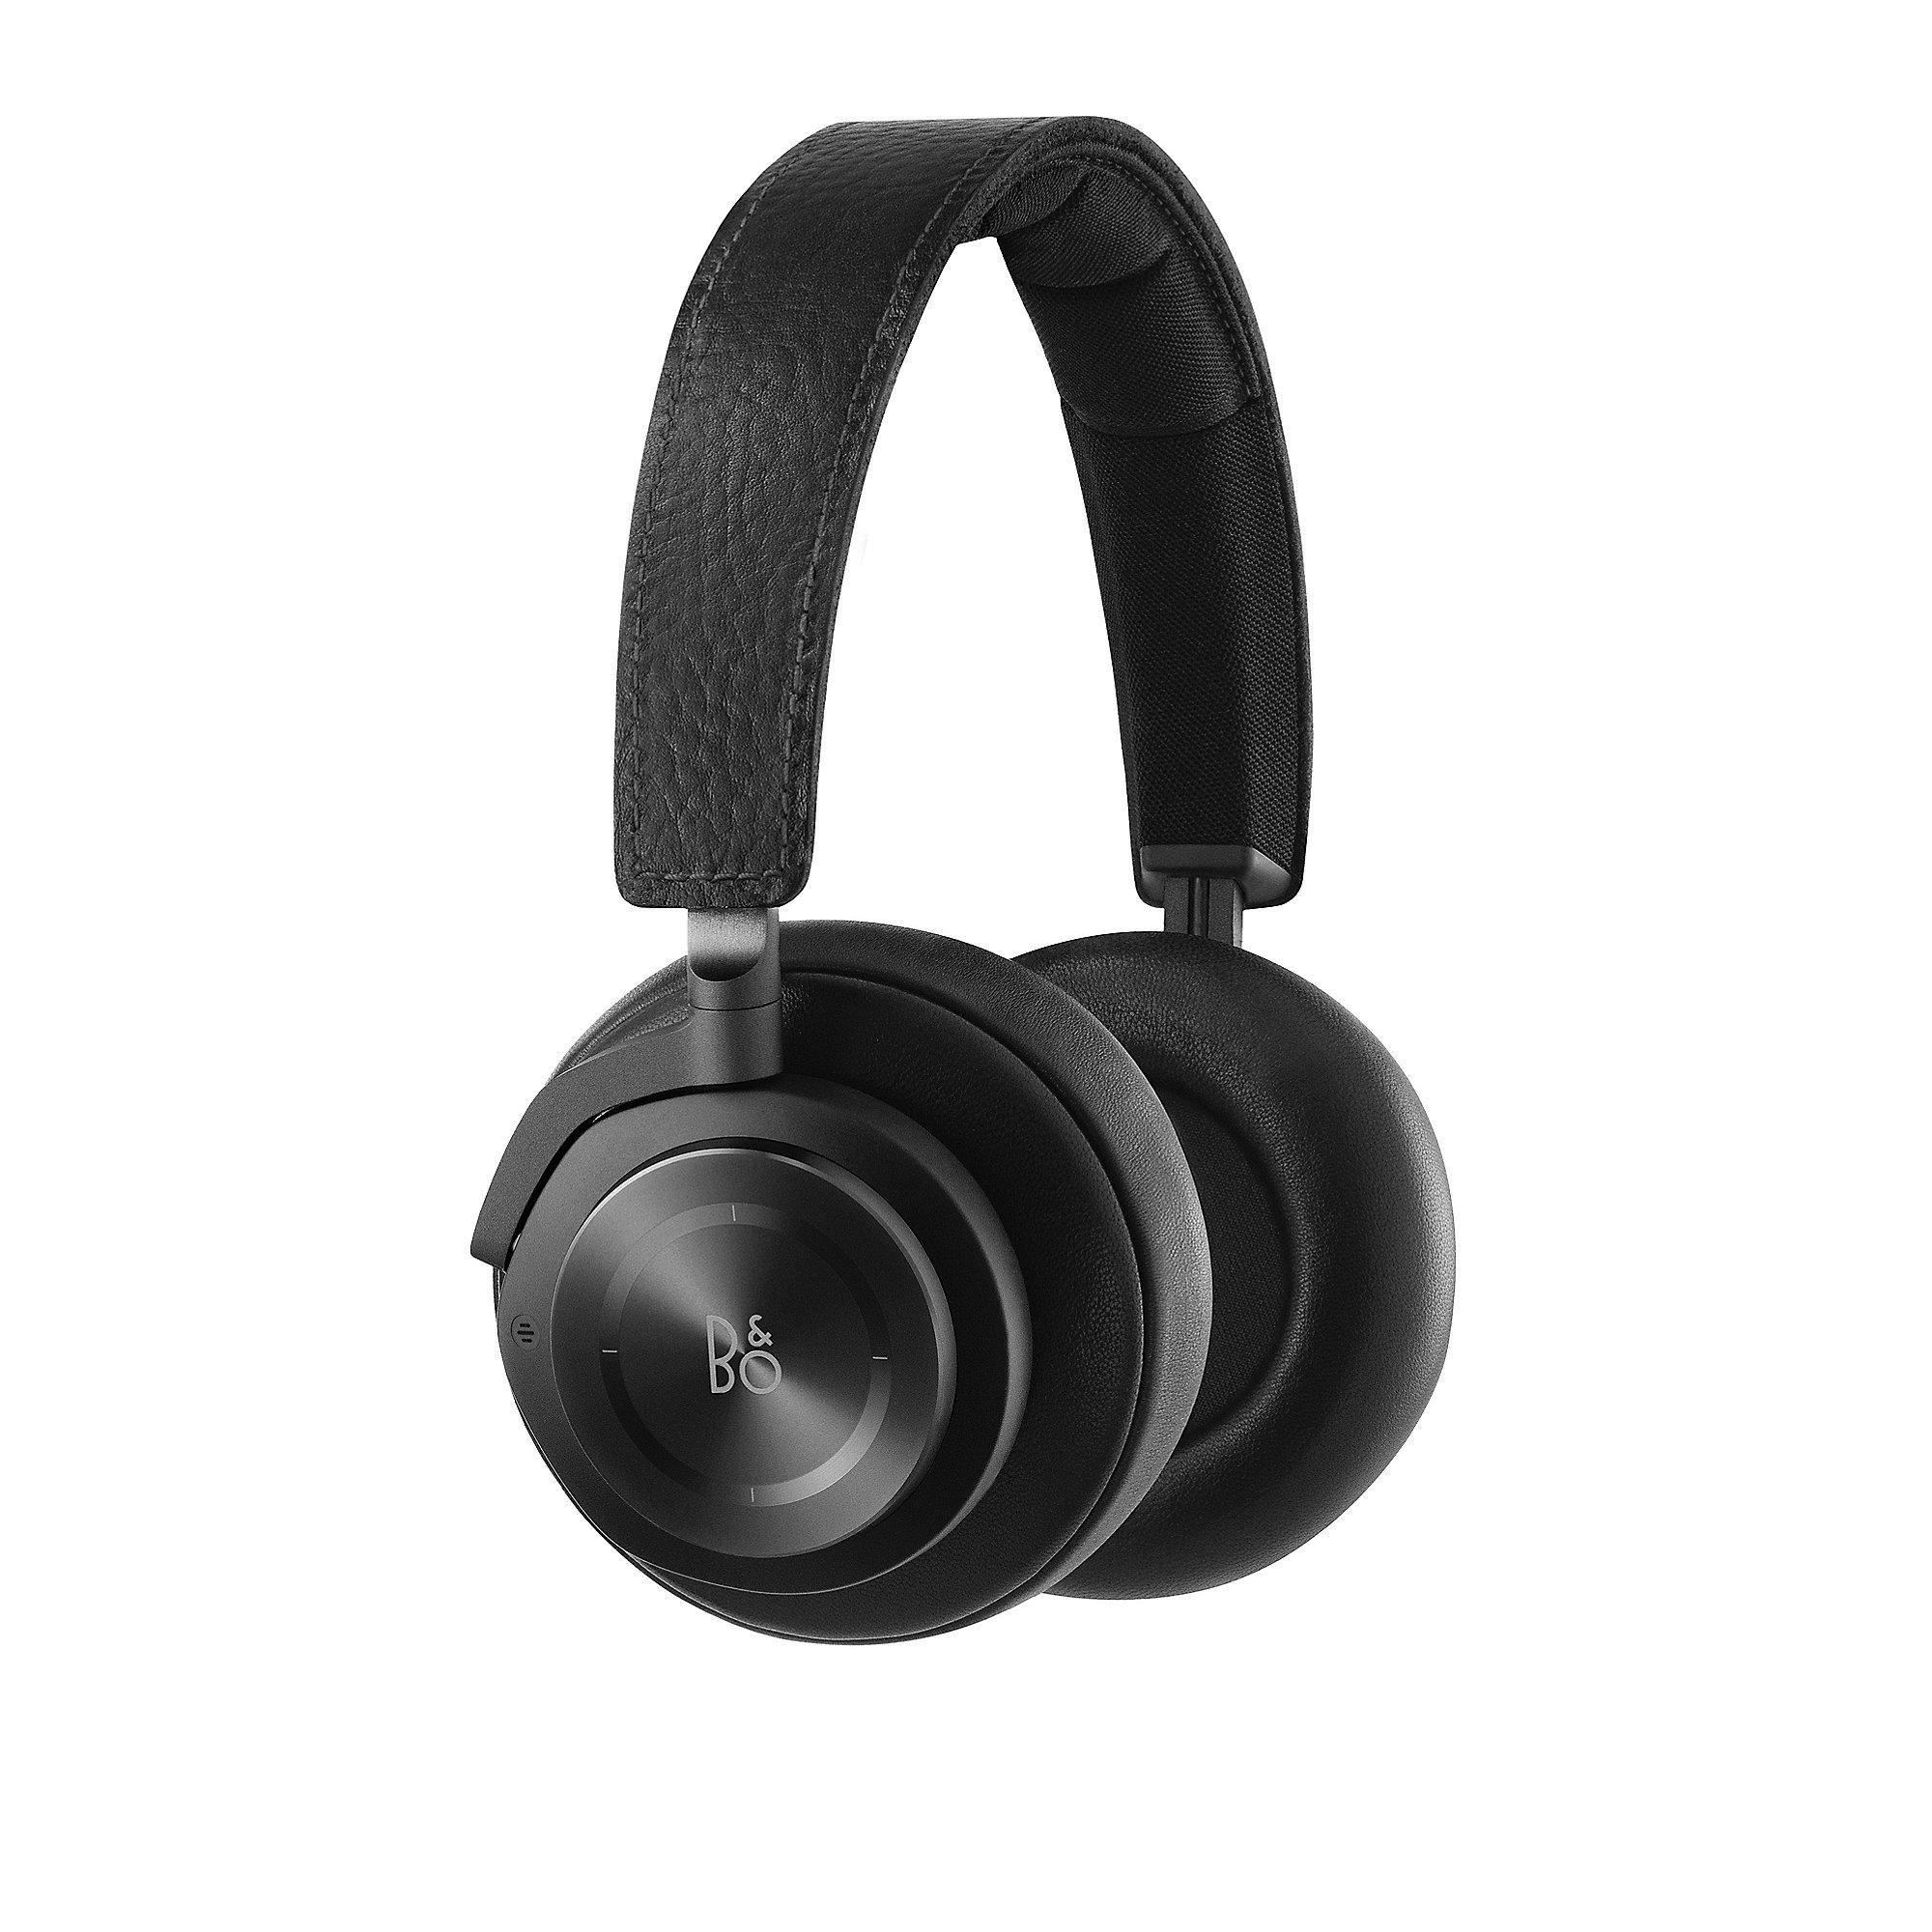 [Cyberport] B&O PLAY BeoPlay H9 Over Ear Kopfhörer schwarz